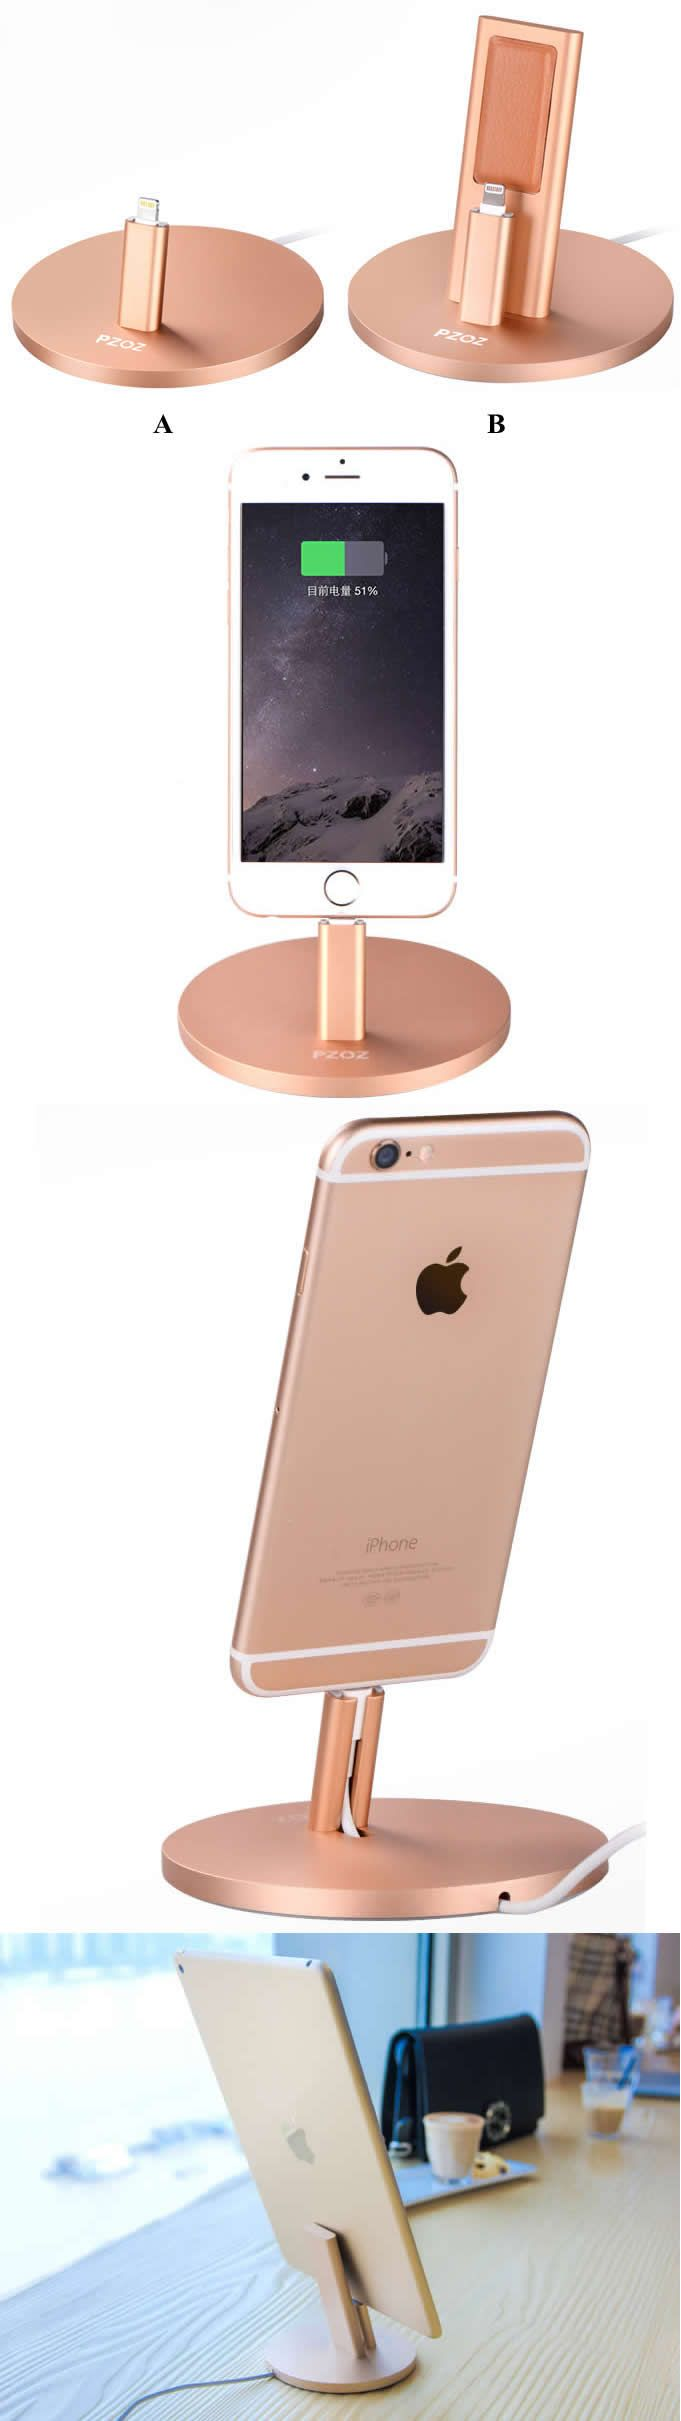 iPhone iPad Desktop Charging Station